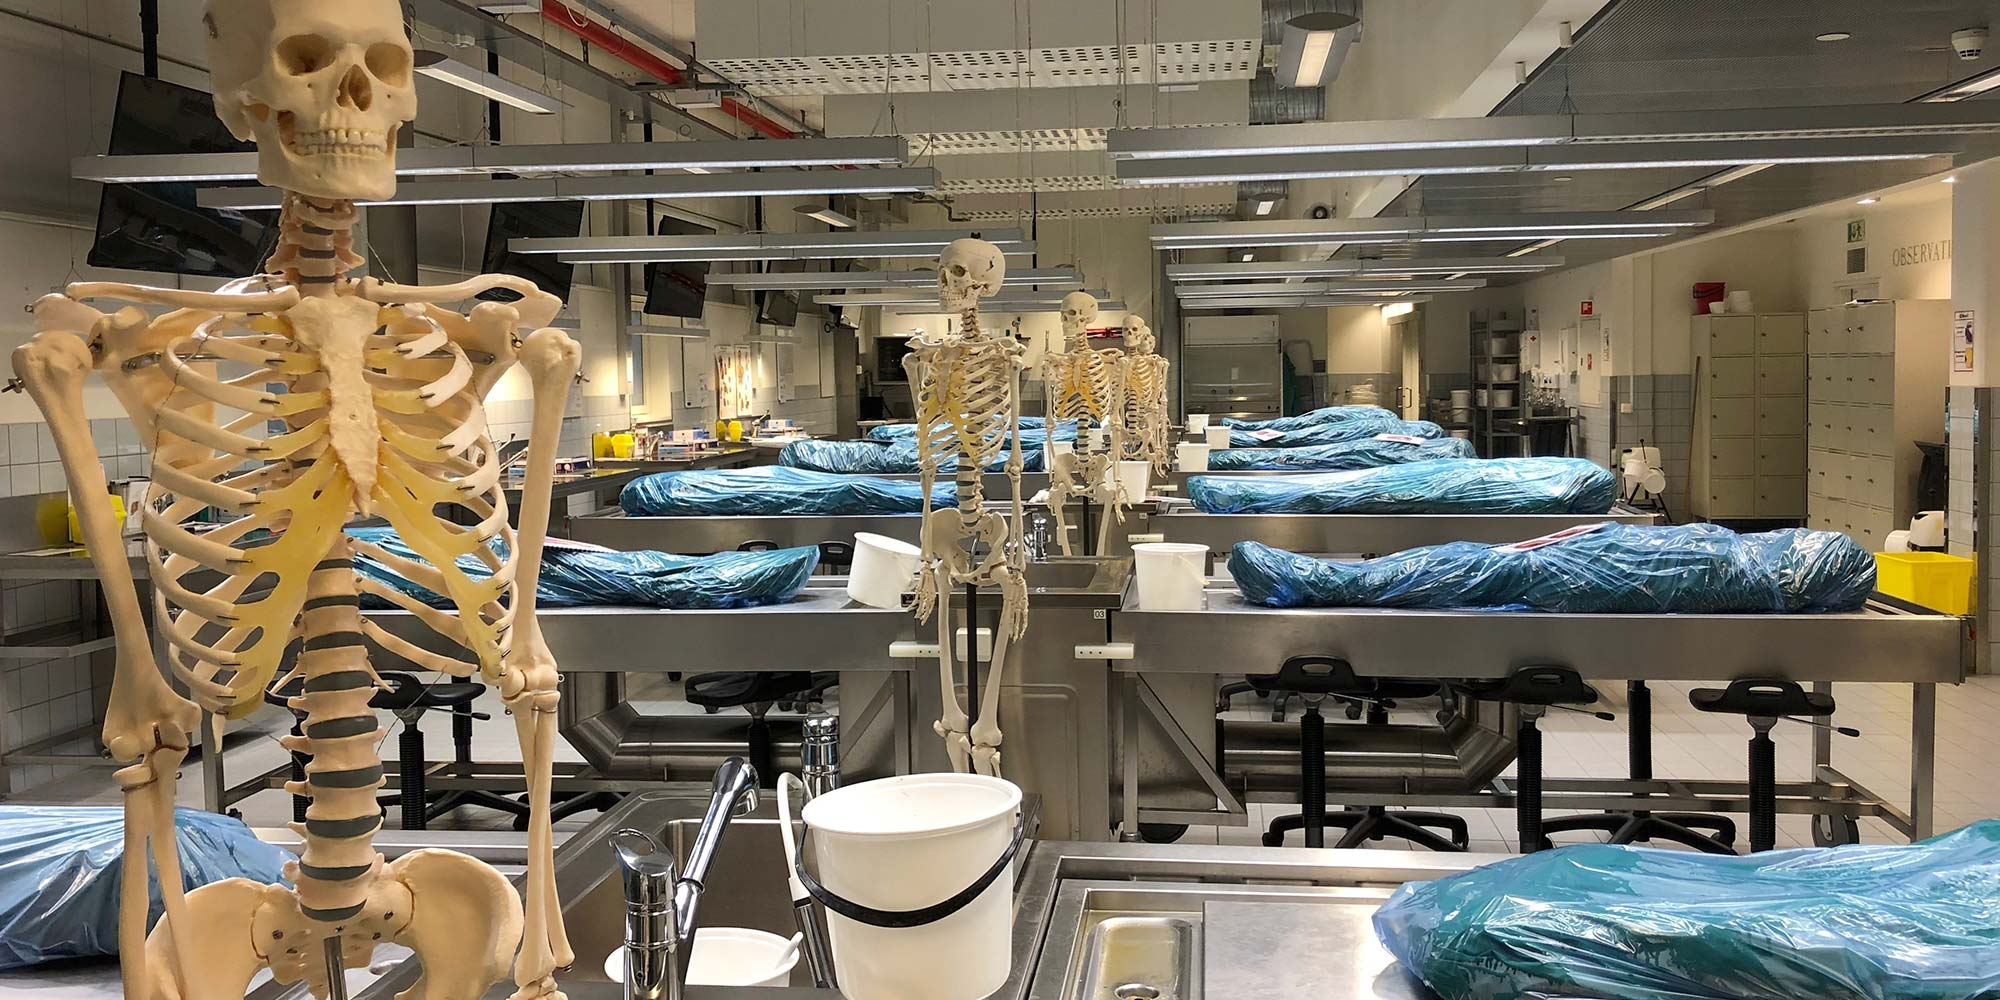 anatomisk1_toppbilde